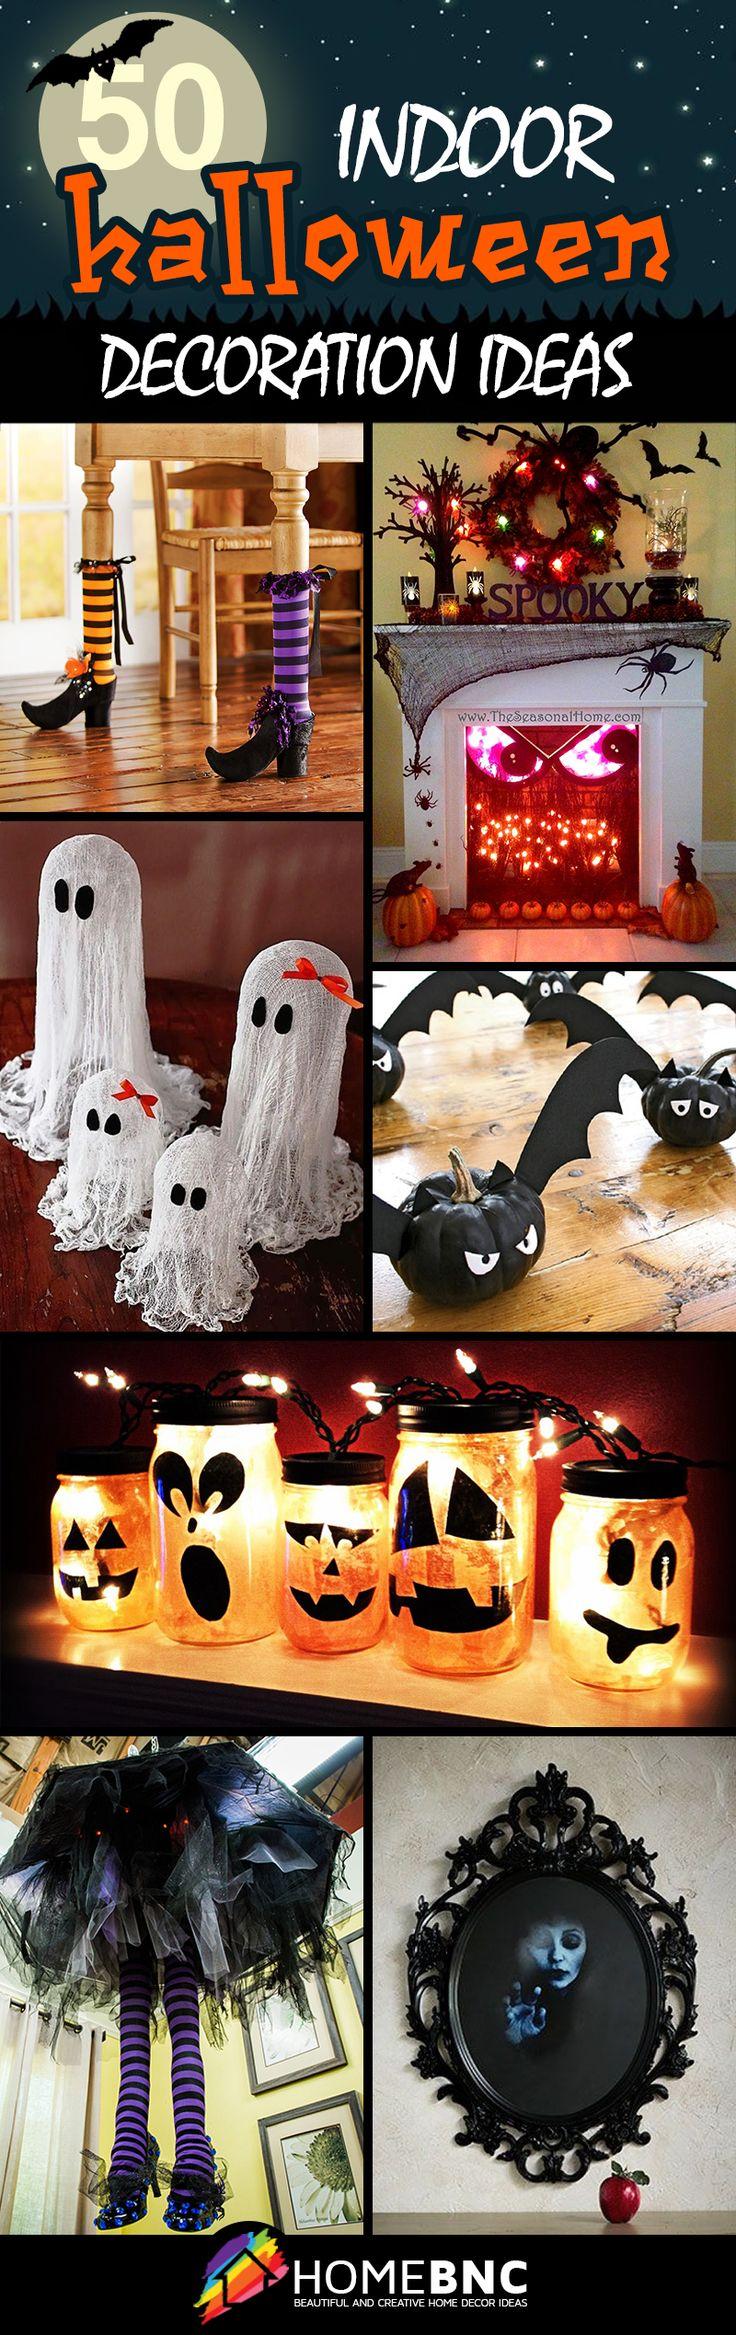 Indoor Halloween Decoration Ideas